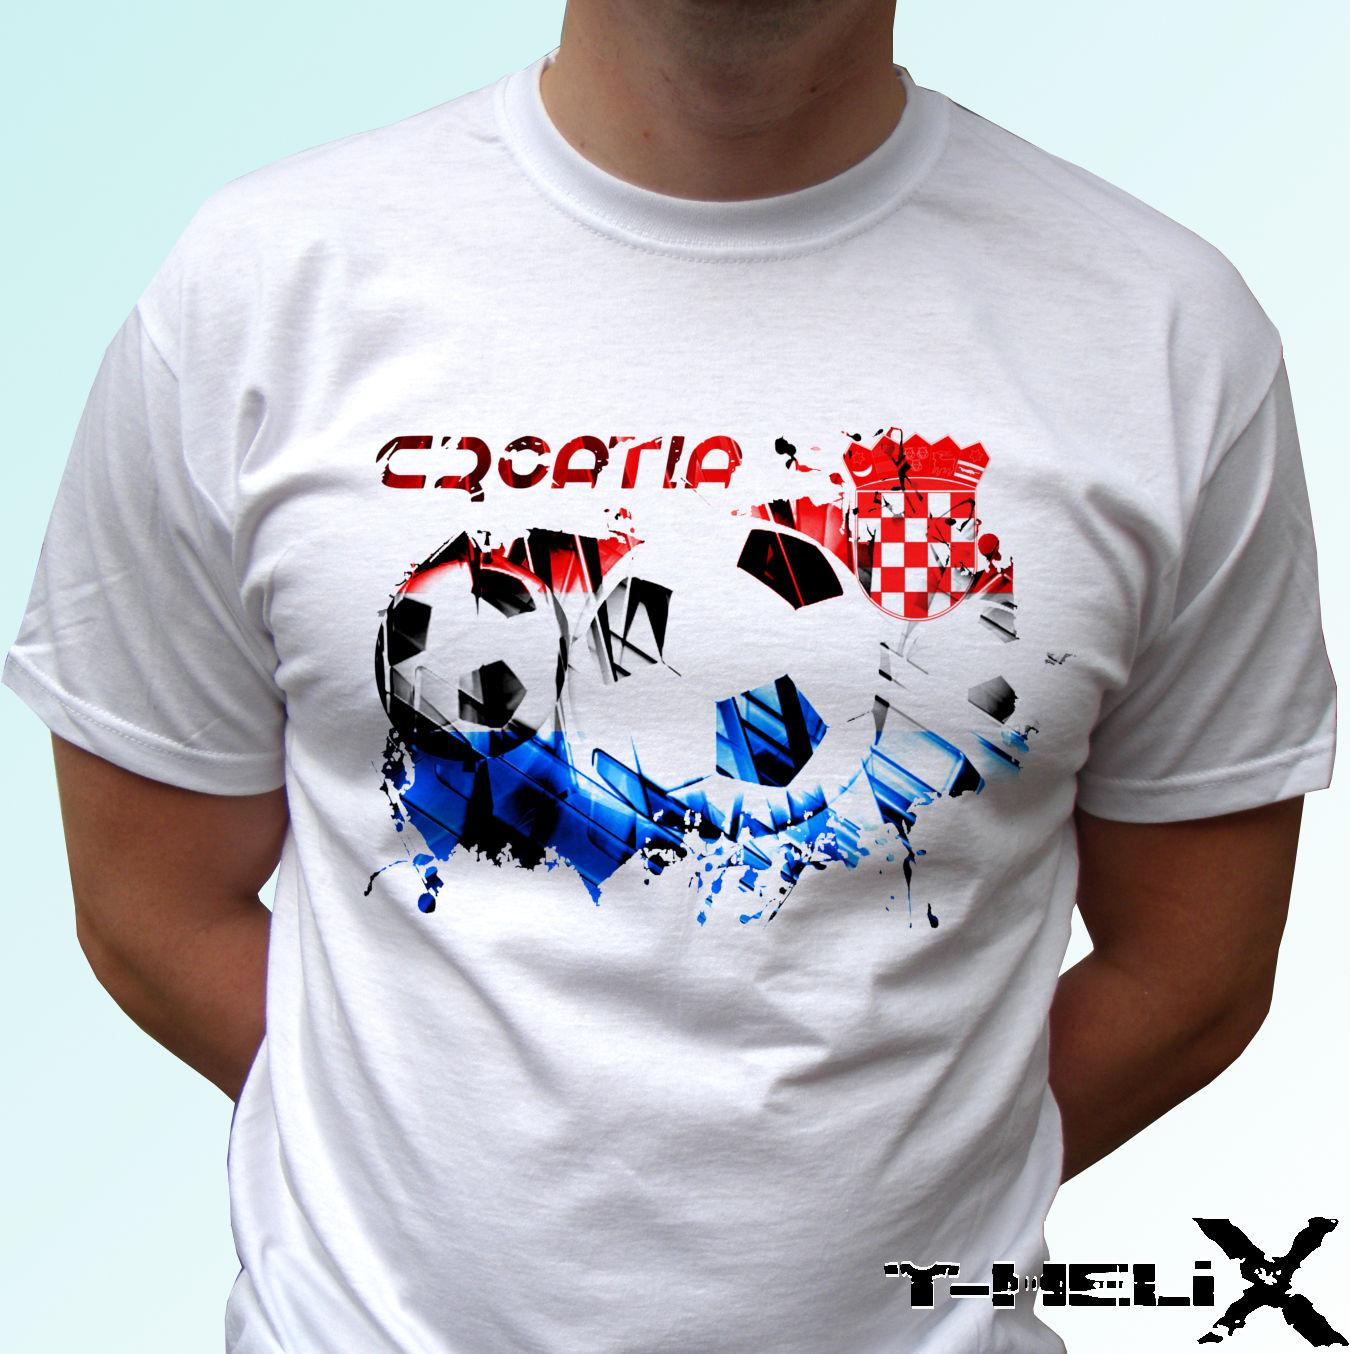 2045bda2c9c6 Croatia Football - White T Shirt Flag Top Design - Mens Womens Kids ...